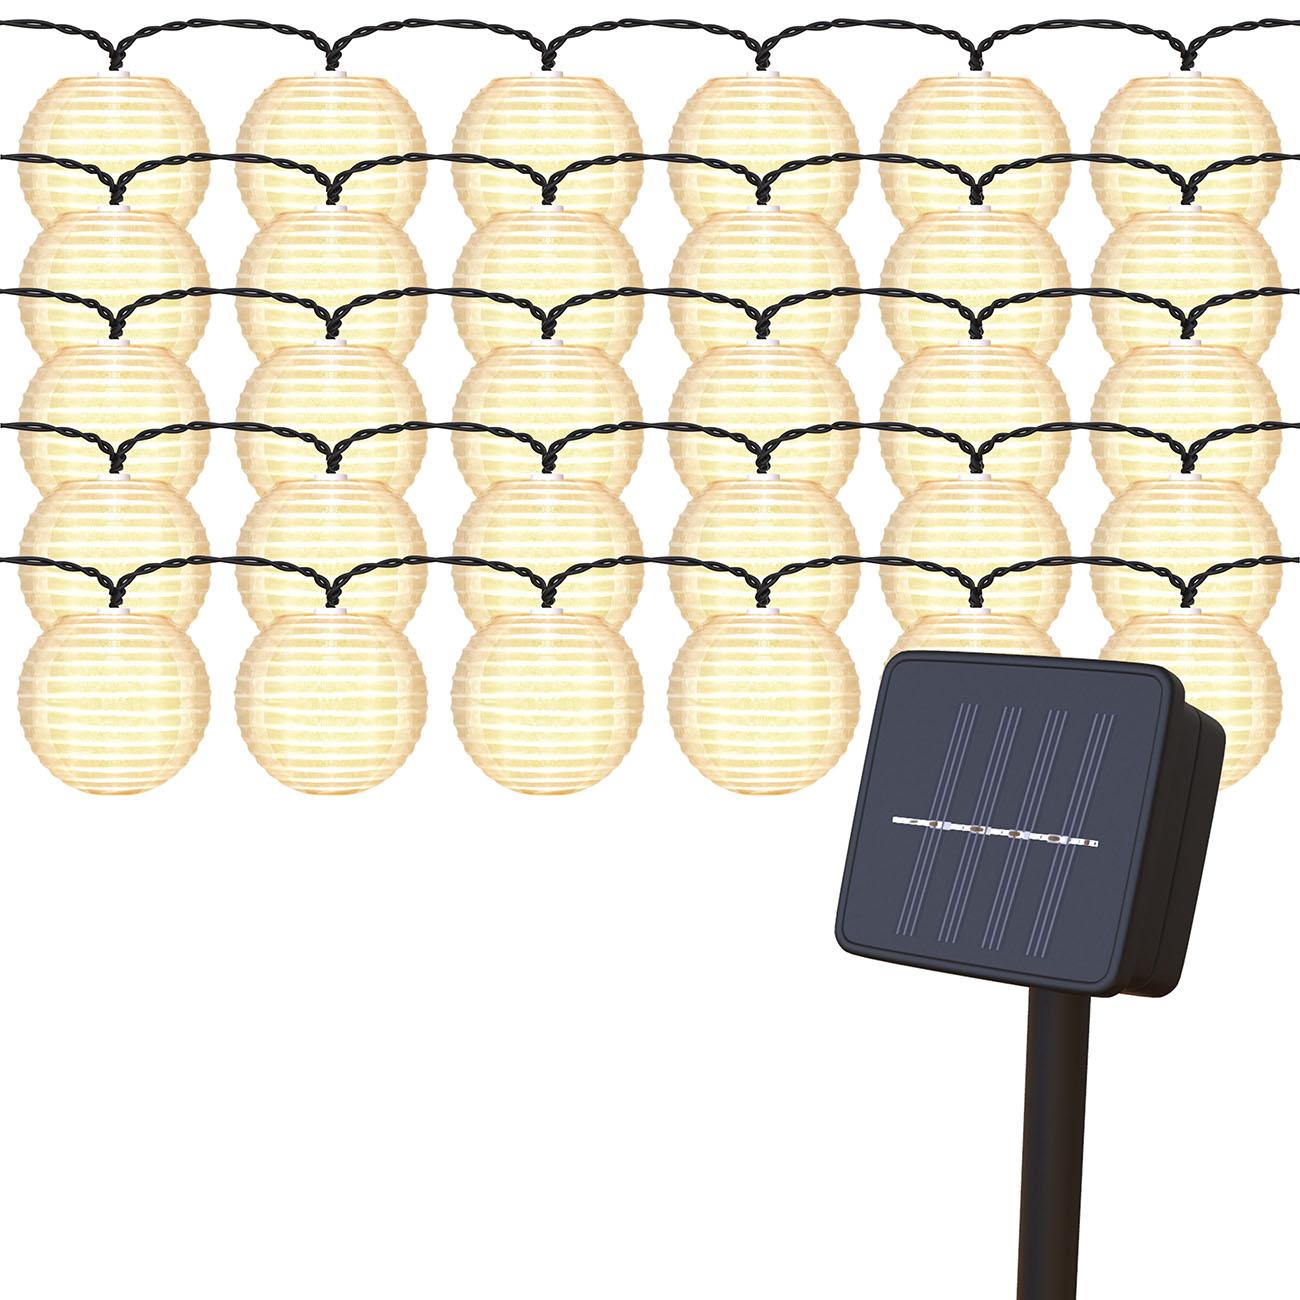 LED Außenlicherkette Solar Lampions 6m - 1